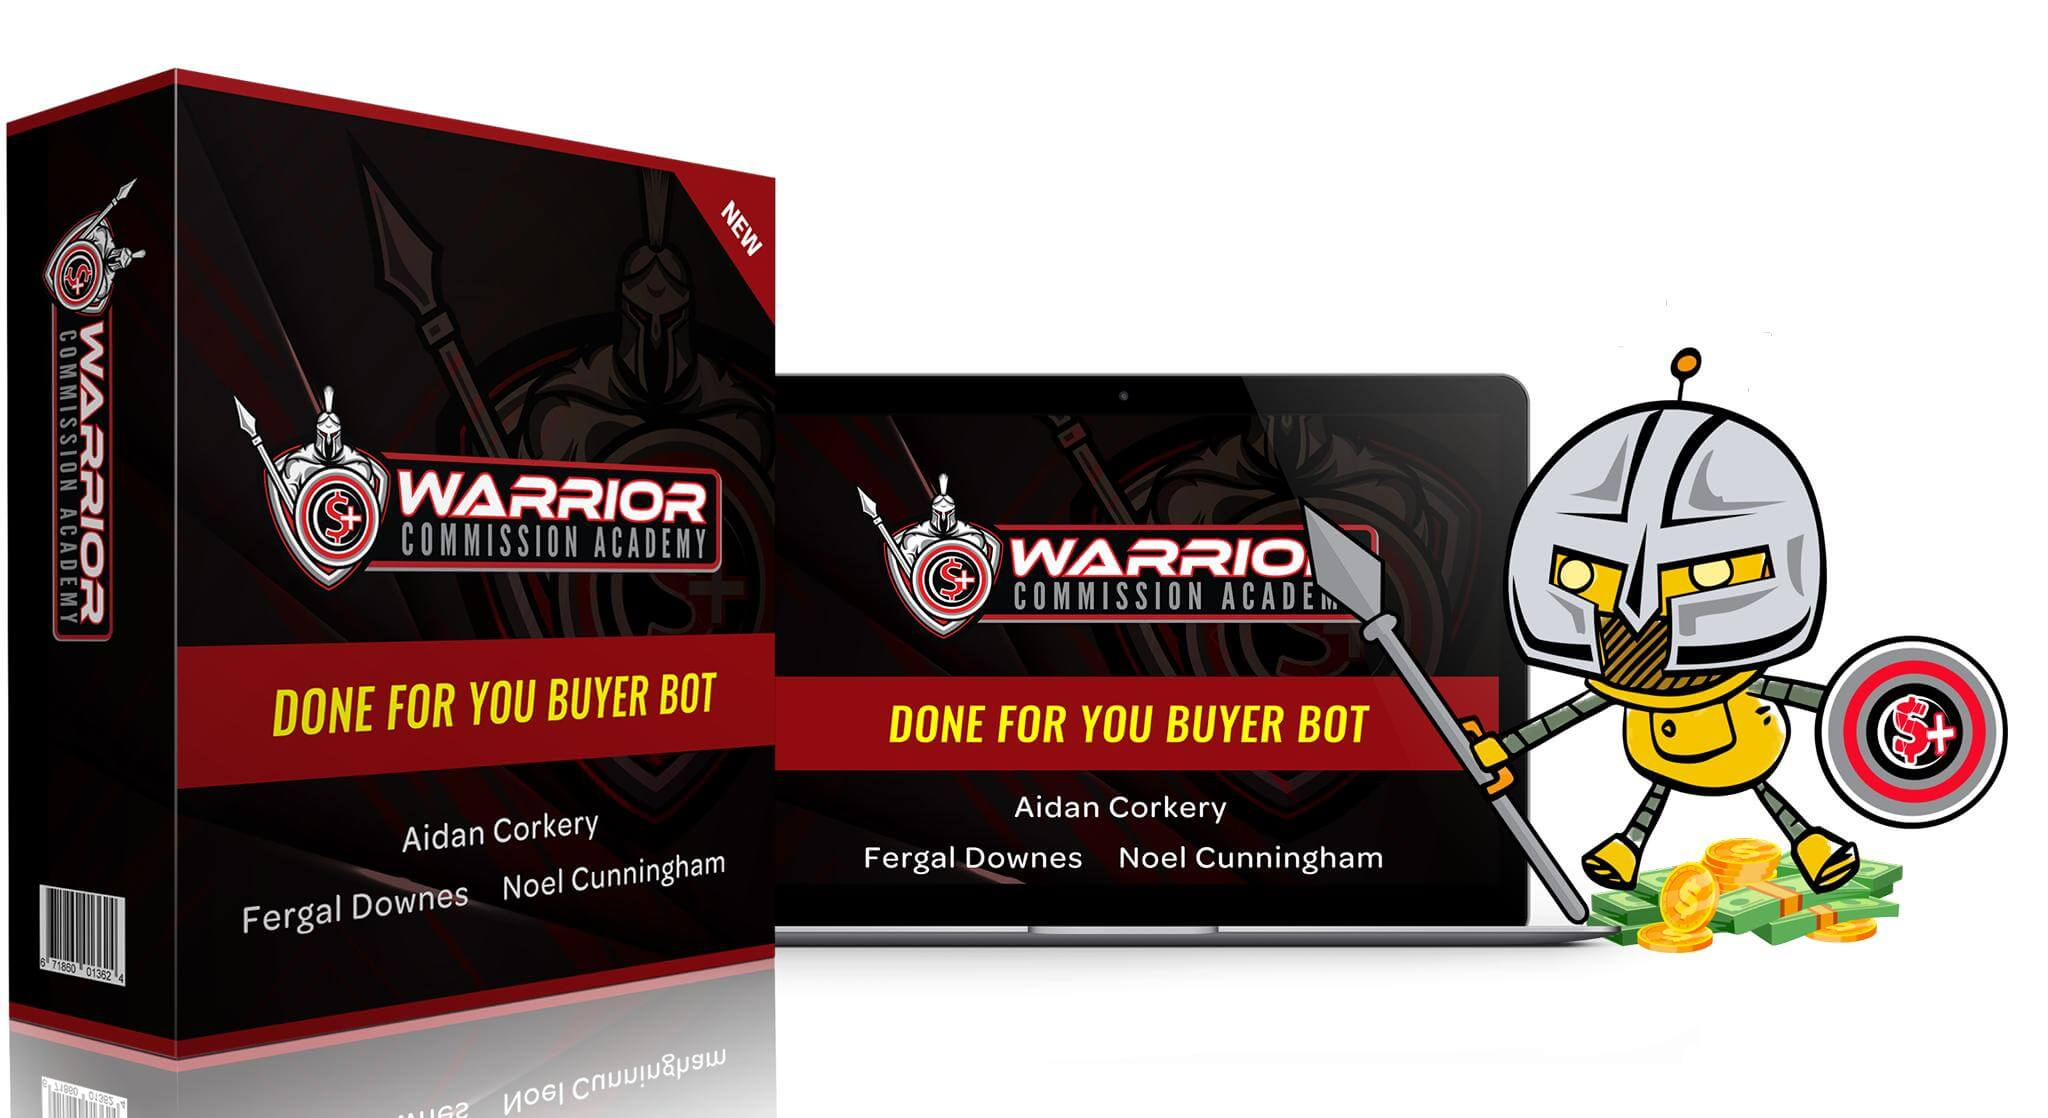 Warrior-Commission-Academy-OTO3